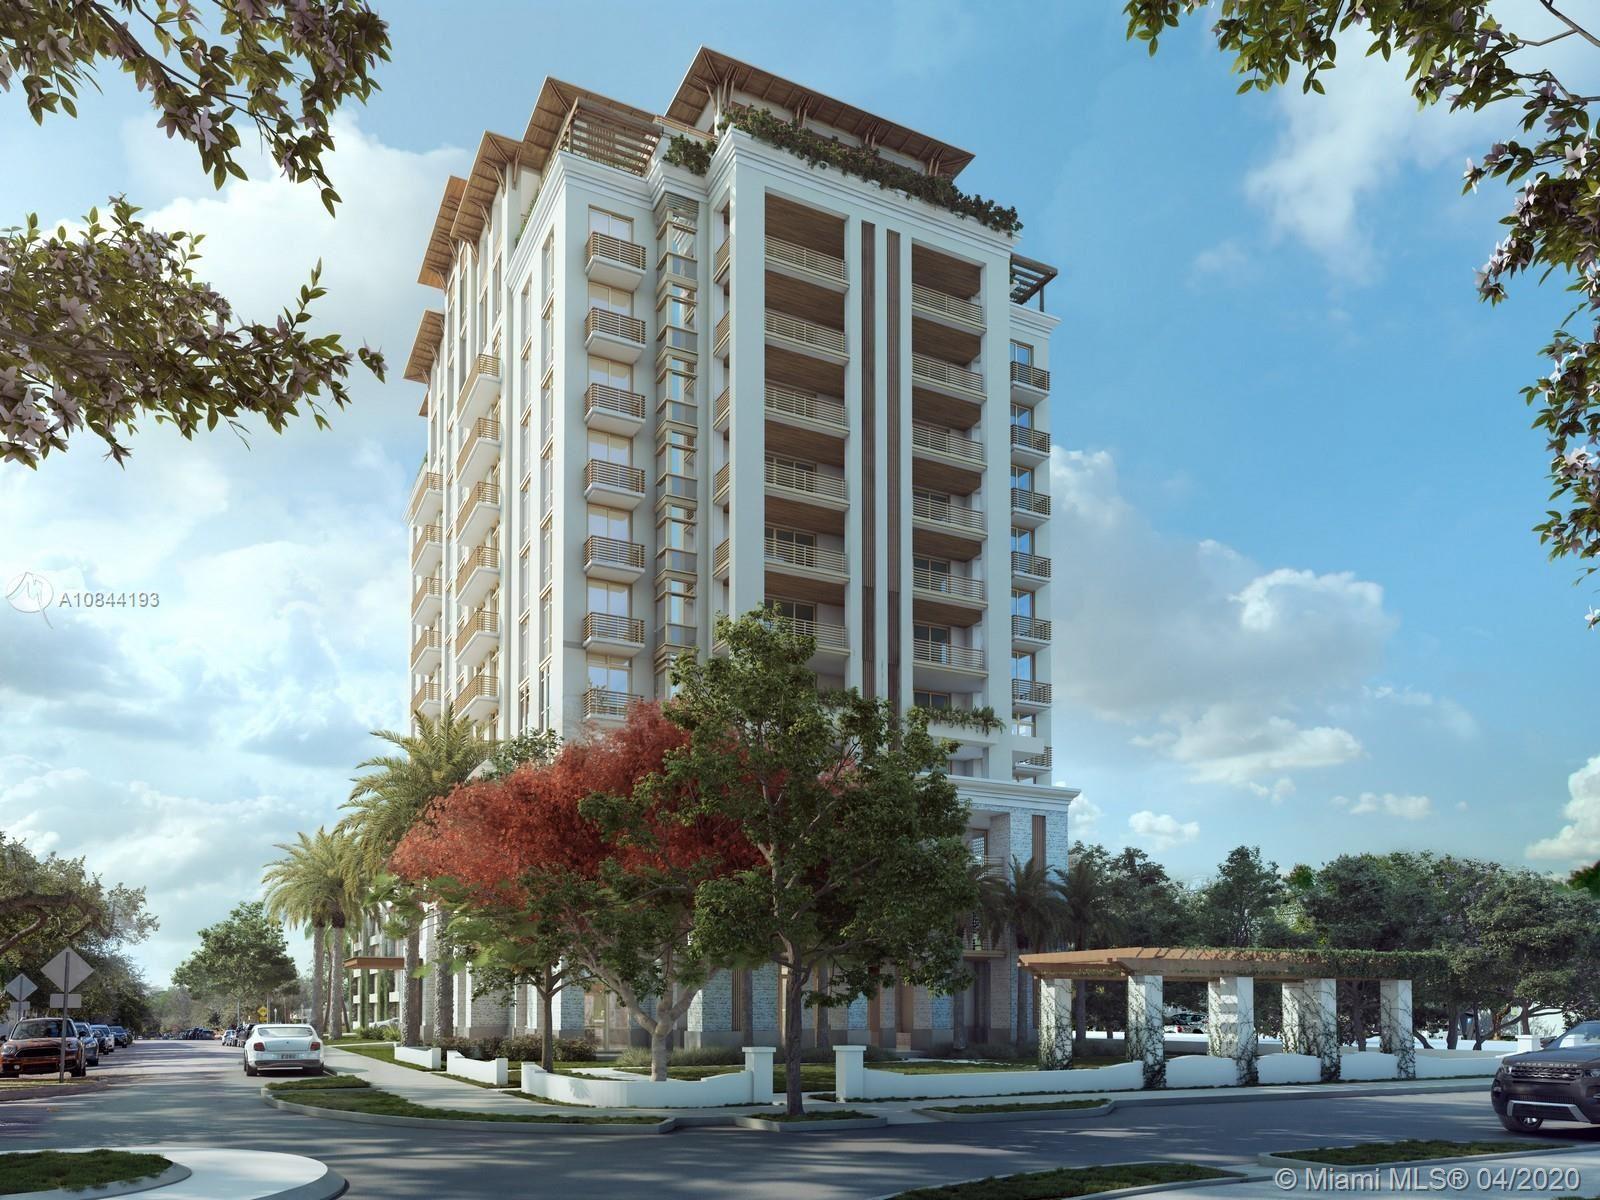 515 Valencia Ave #804, Coral Gables, FL 33134 - #: A10844193